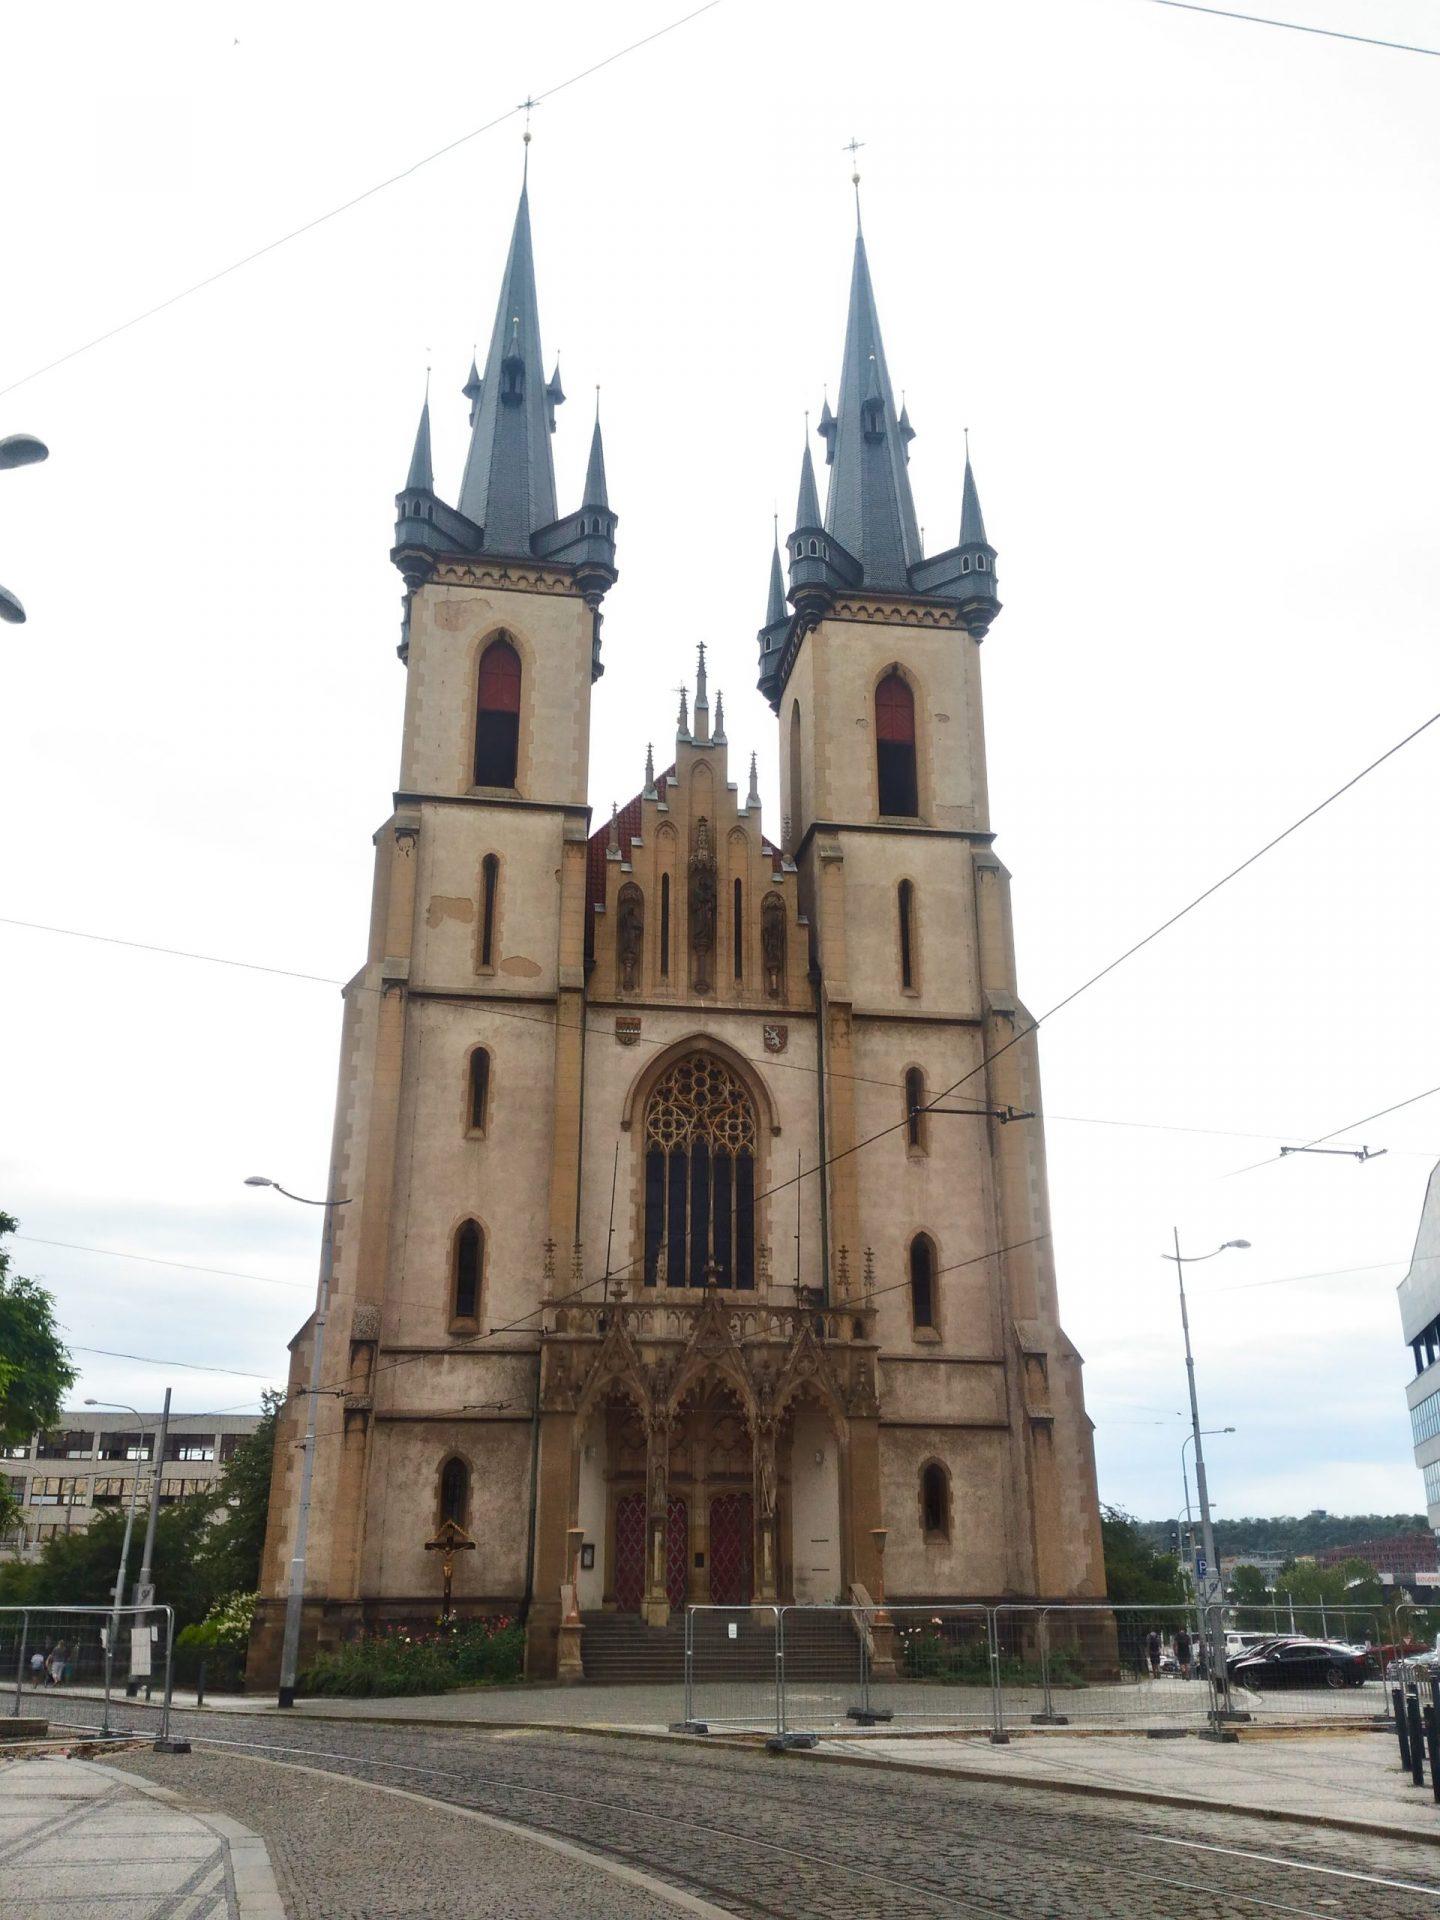 Костёл Святого Антония Падуанского, Прага, Чехия. Август, 2018